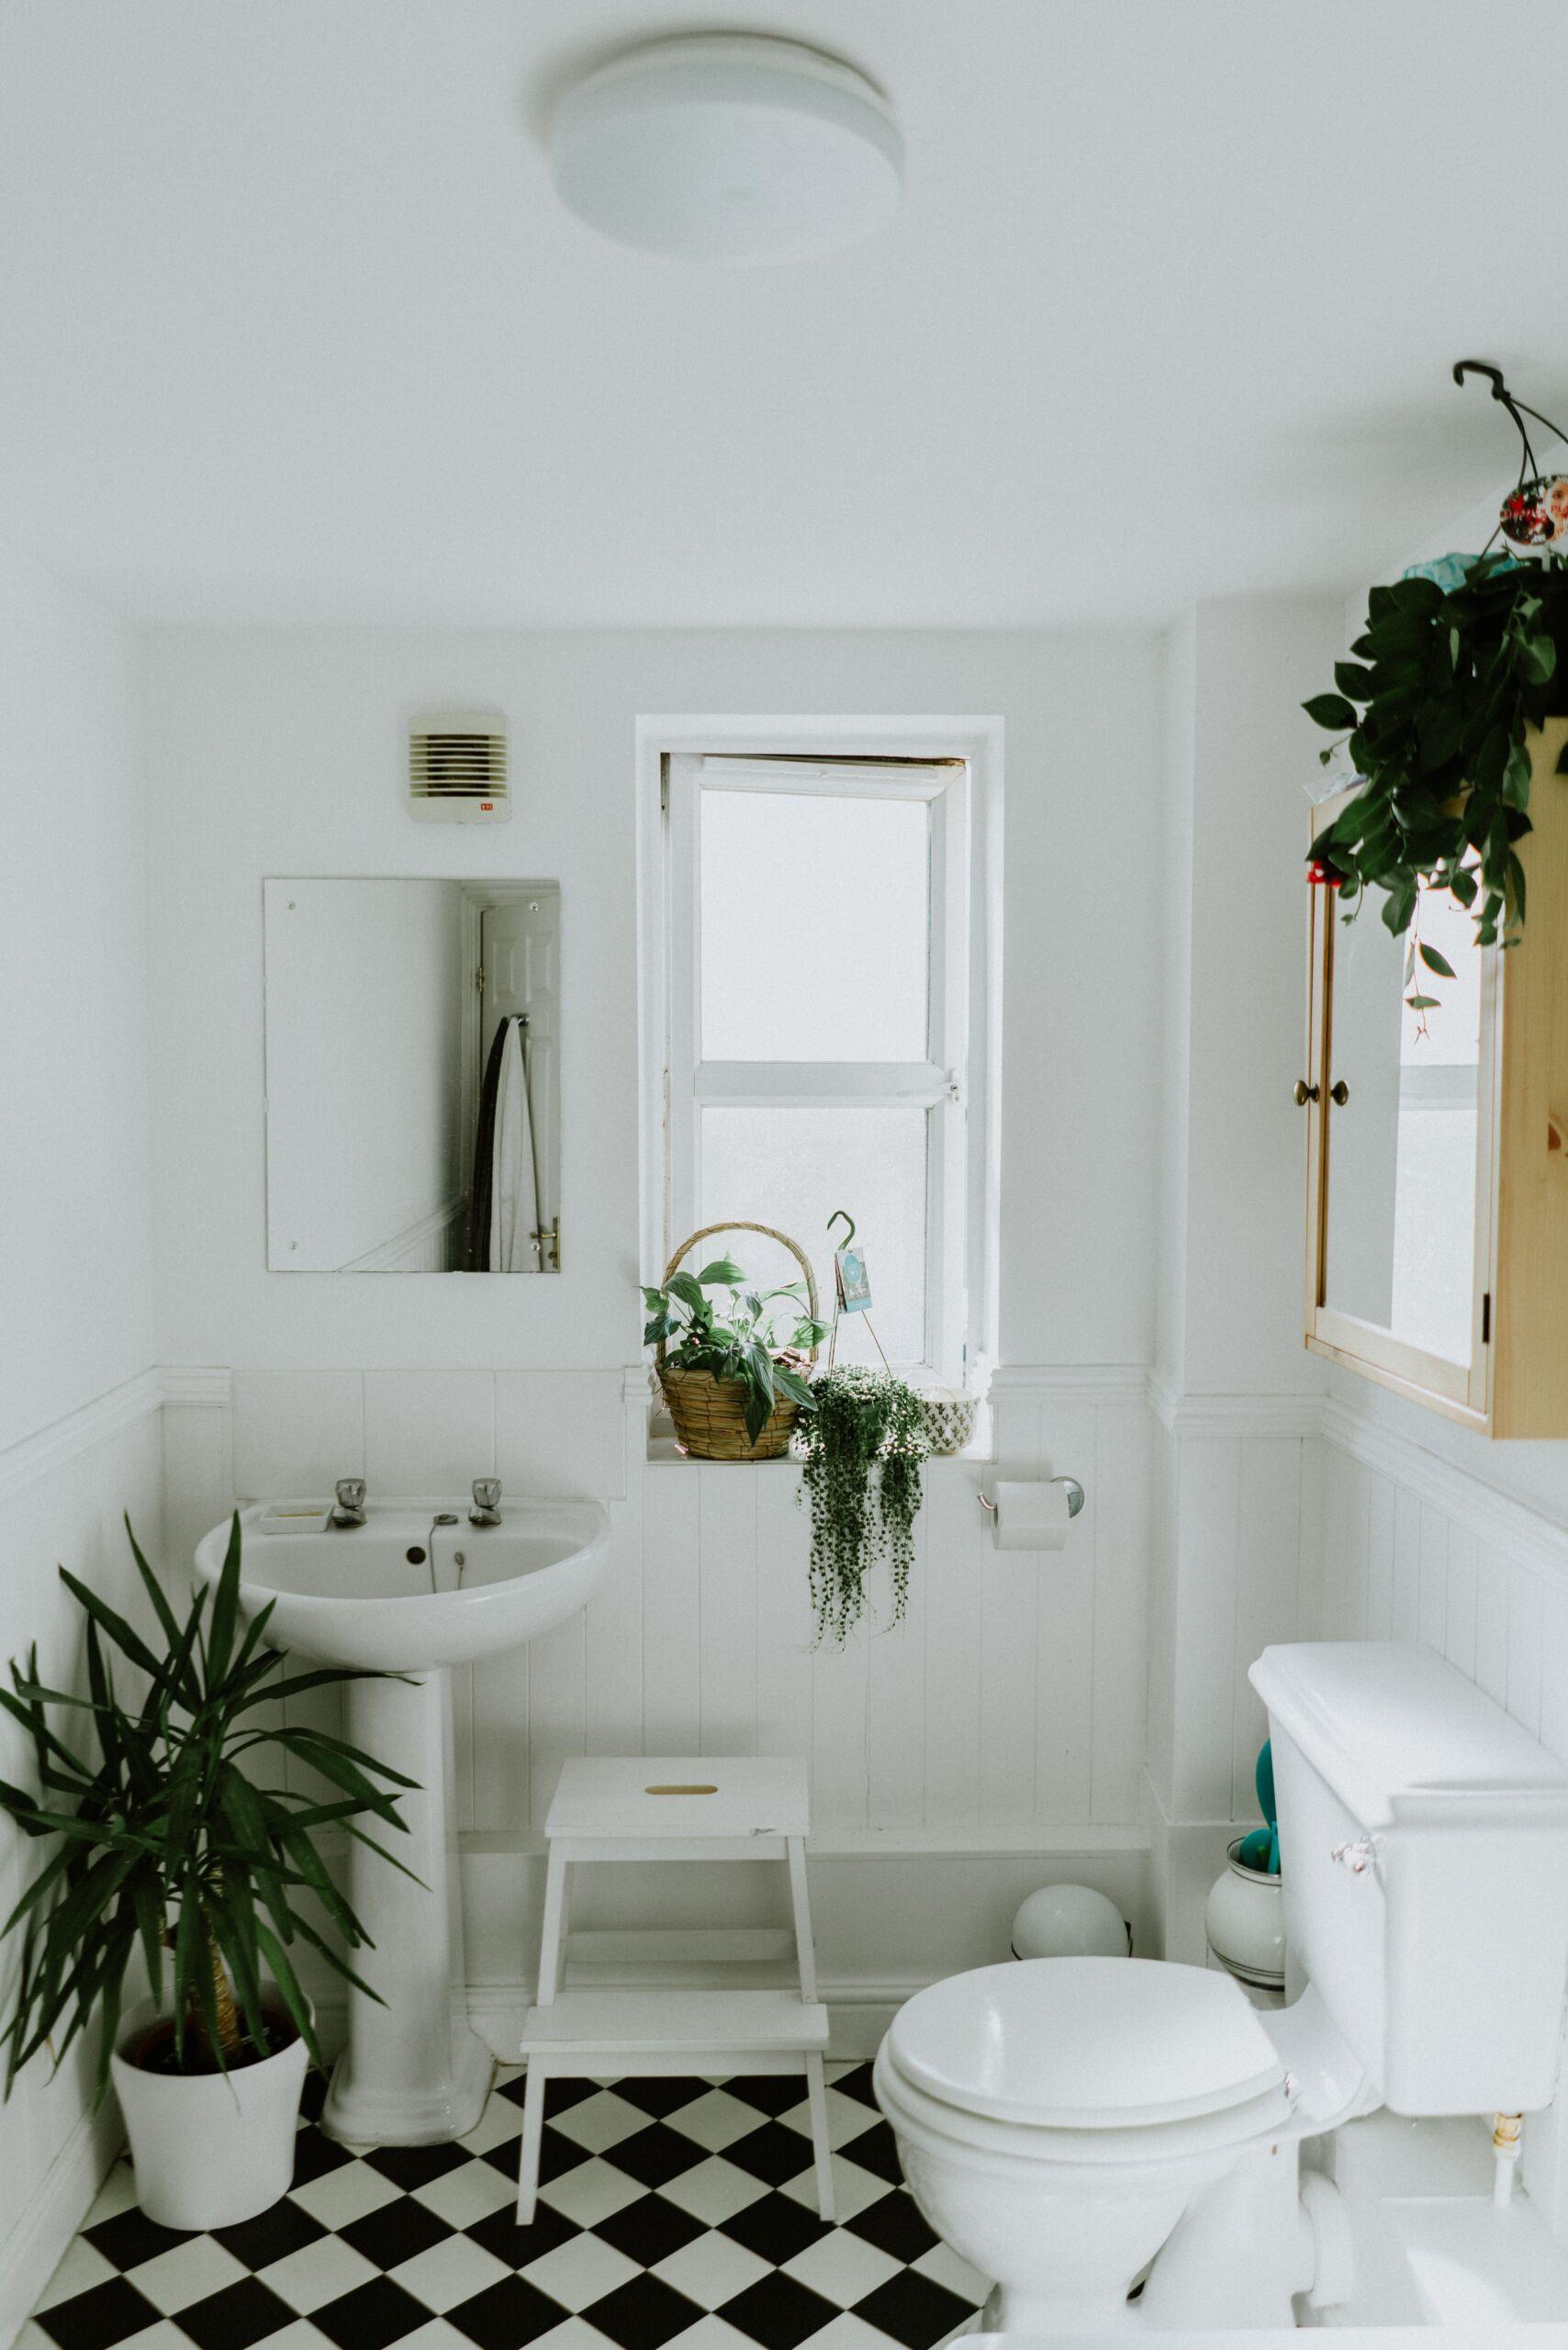 Ways to Build an Environmentally Friendly Bathroom